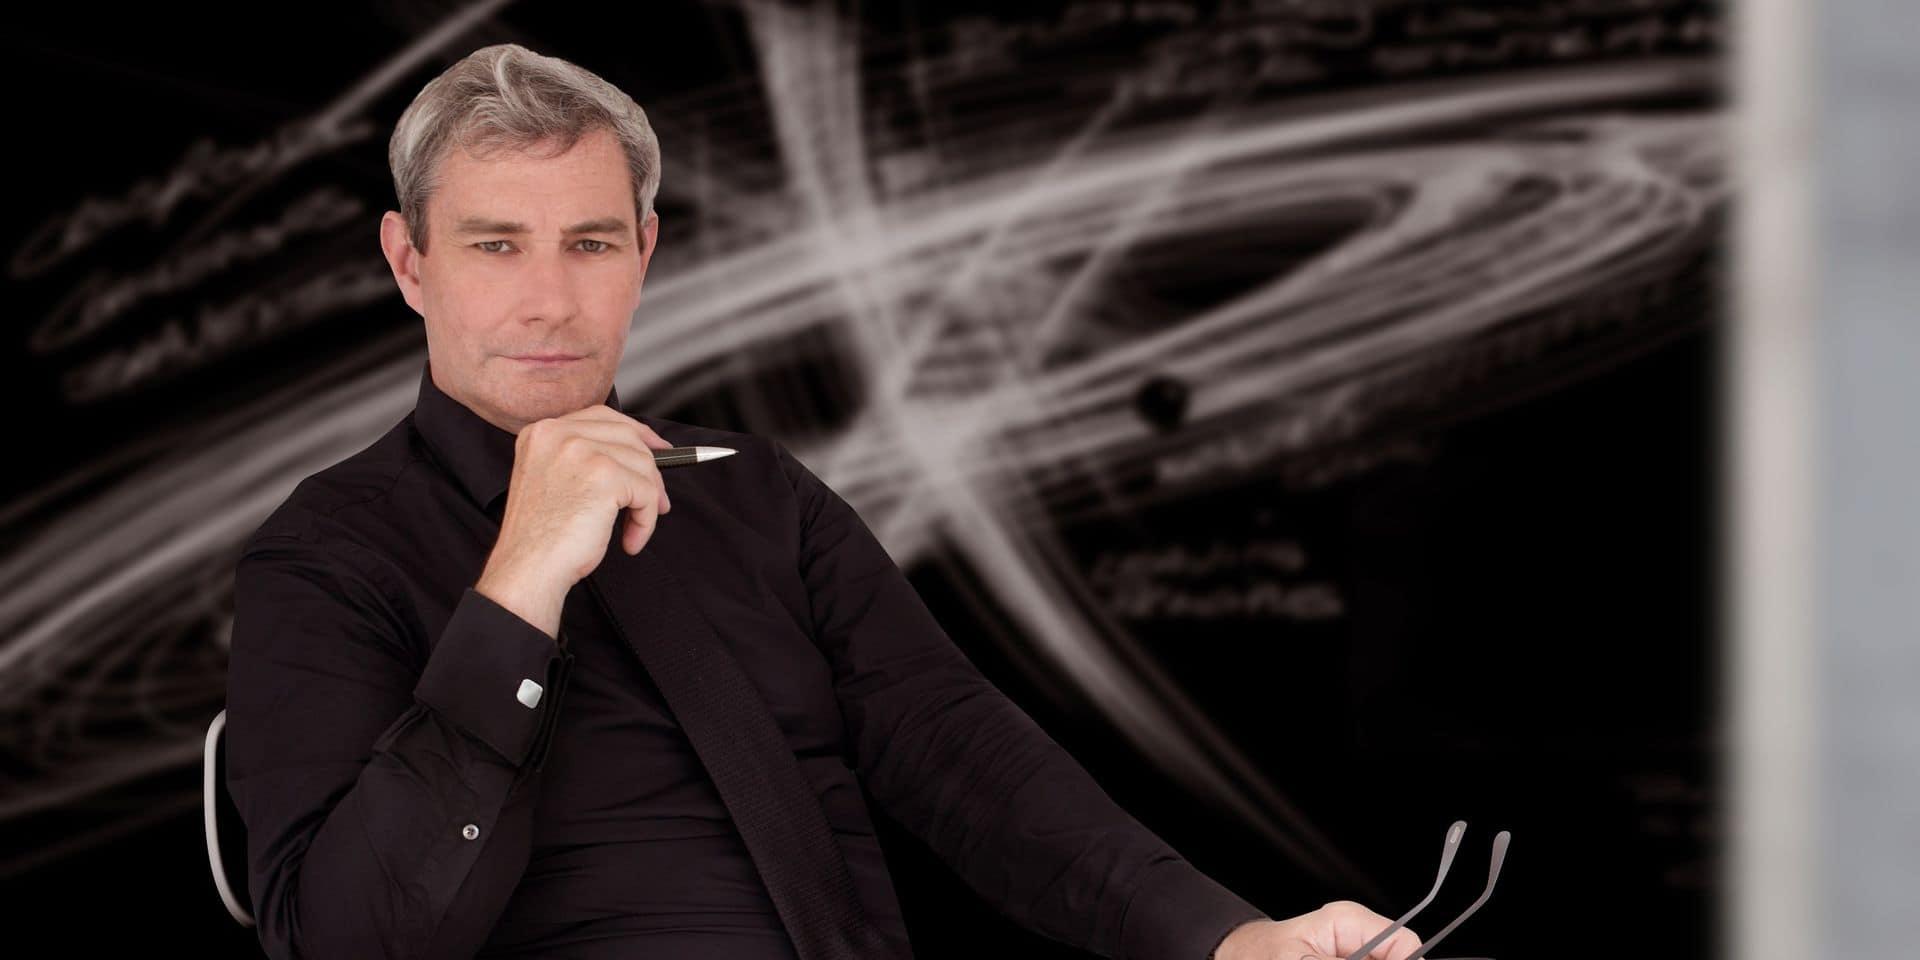 Le designer Belge Luc Donckerwolke devient Chief Creative Officer de Hyundai